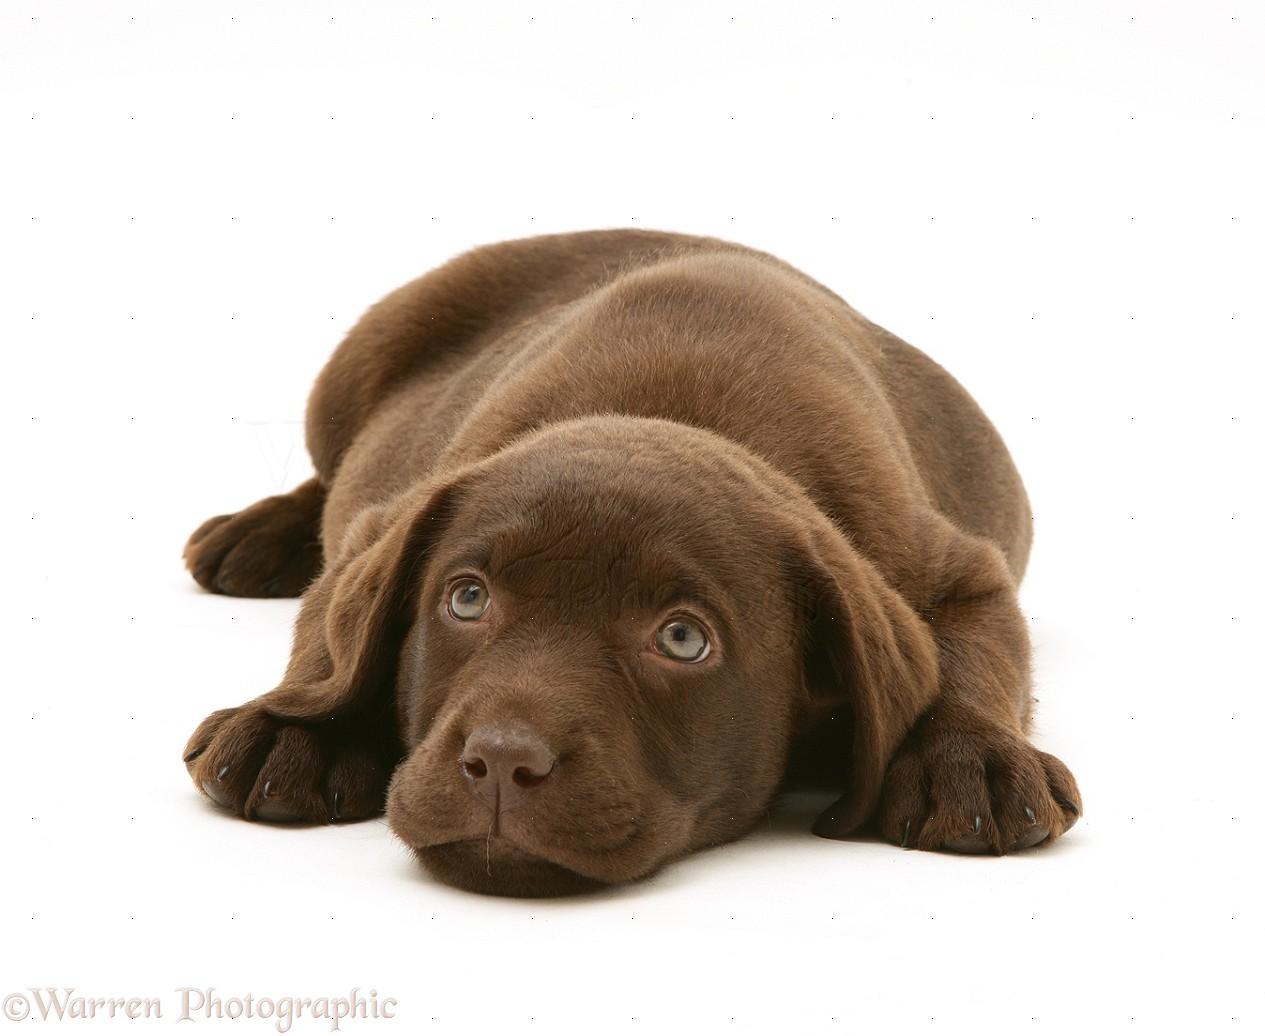 Dog: Chocolate Labrador Retriever puppy chin on floor photo - WP14930